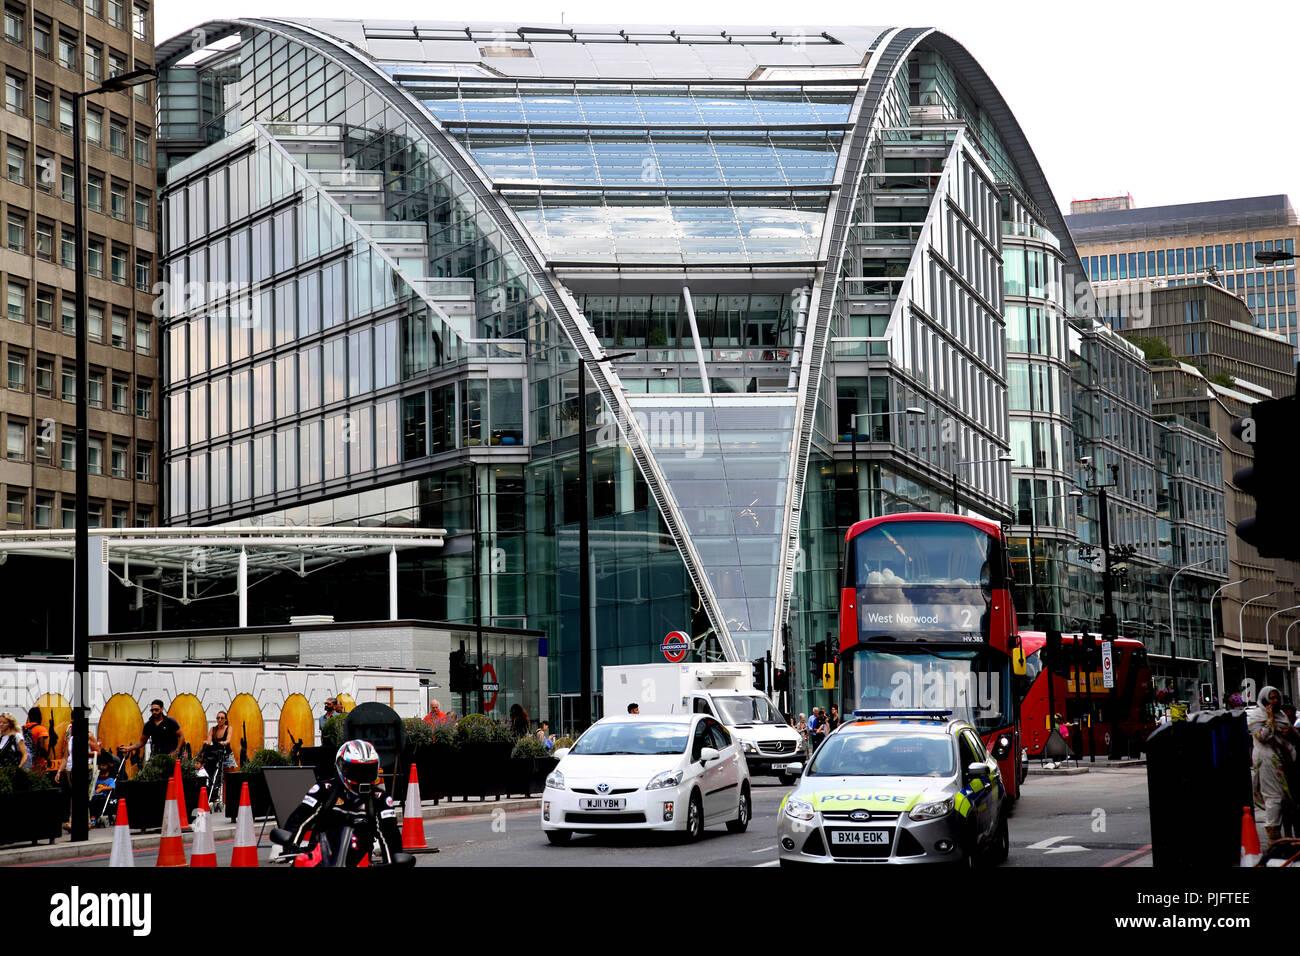 City Of London Police Car Stock Photos & City Of London